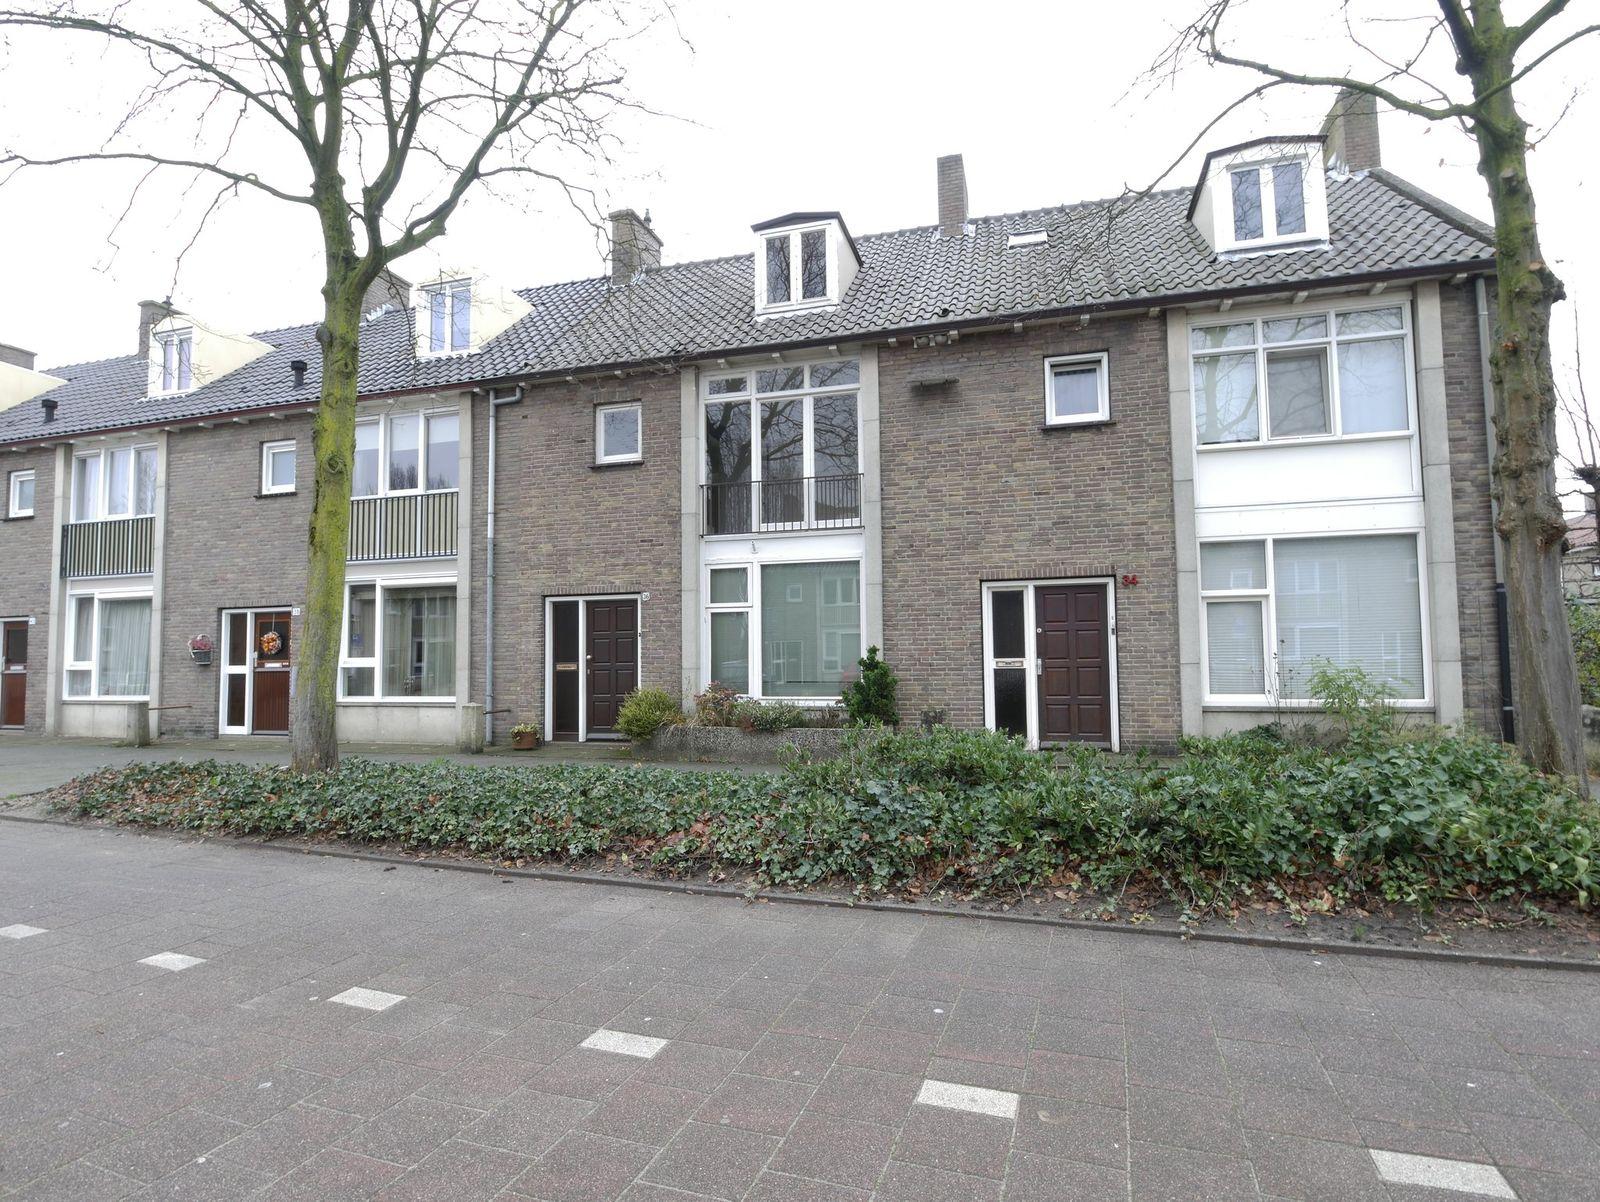 Noordende 36, Helmond